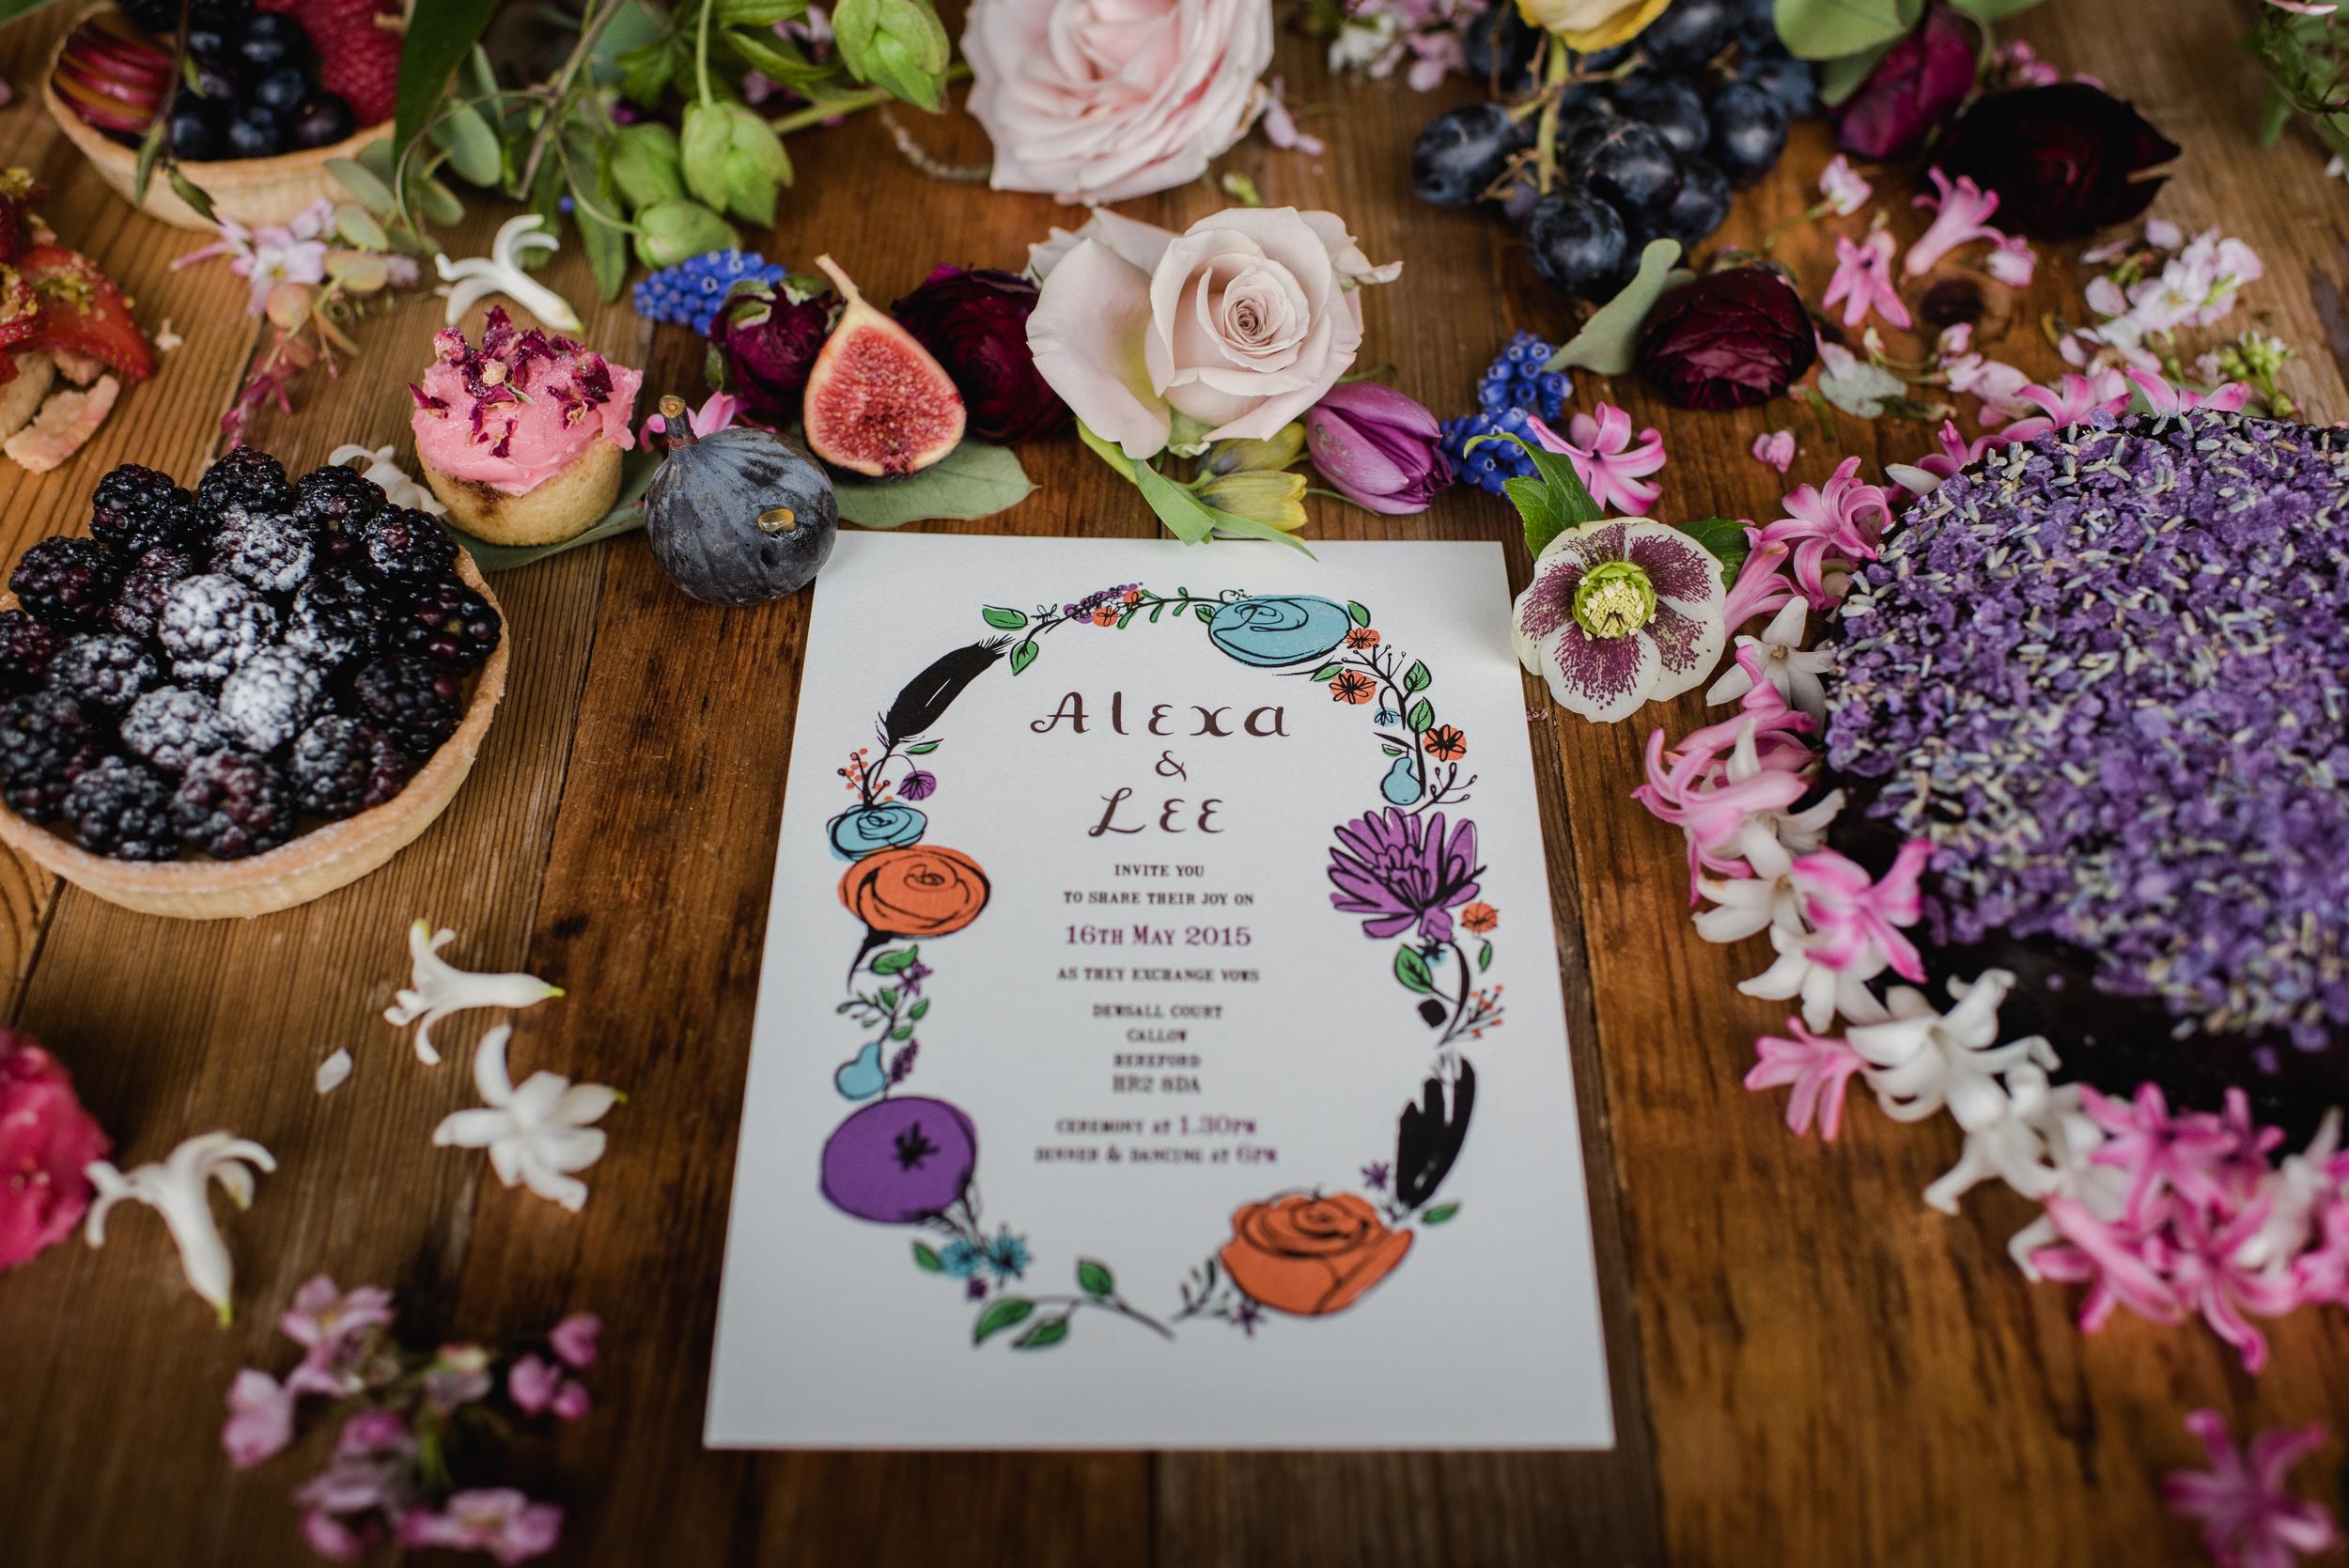 Flora & Fauna Wedding Invitation, photograph by  Alexa Loy